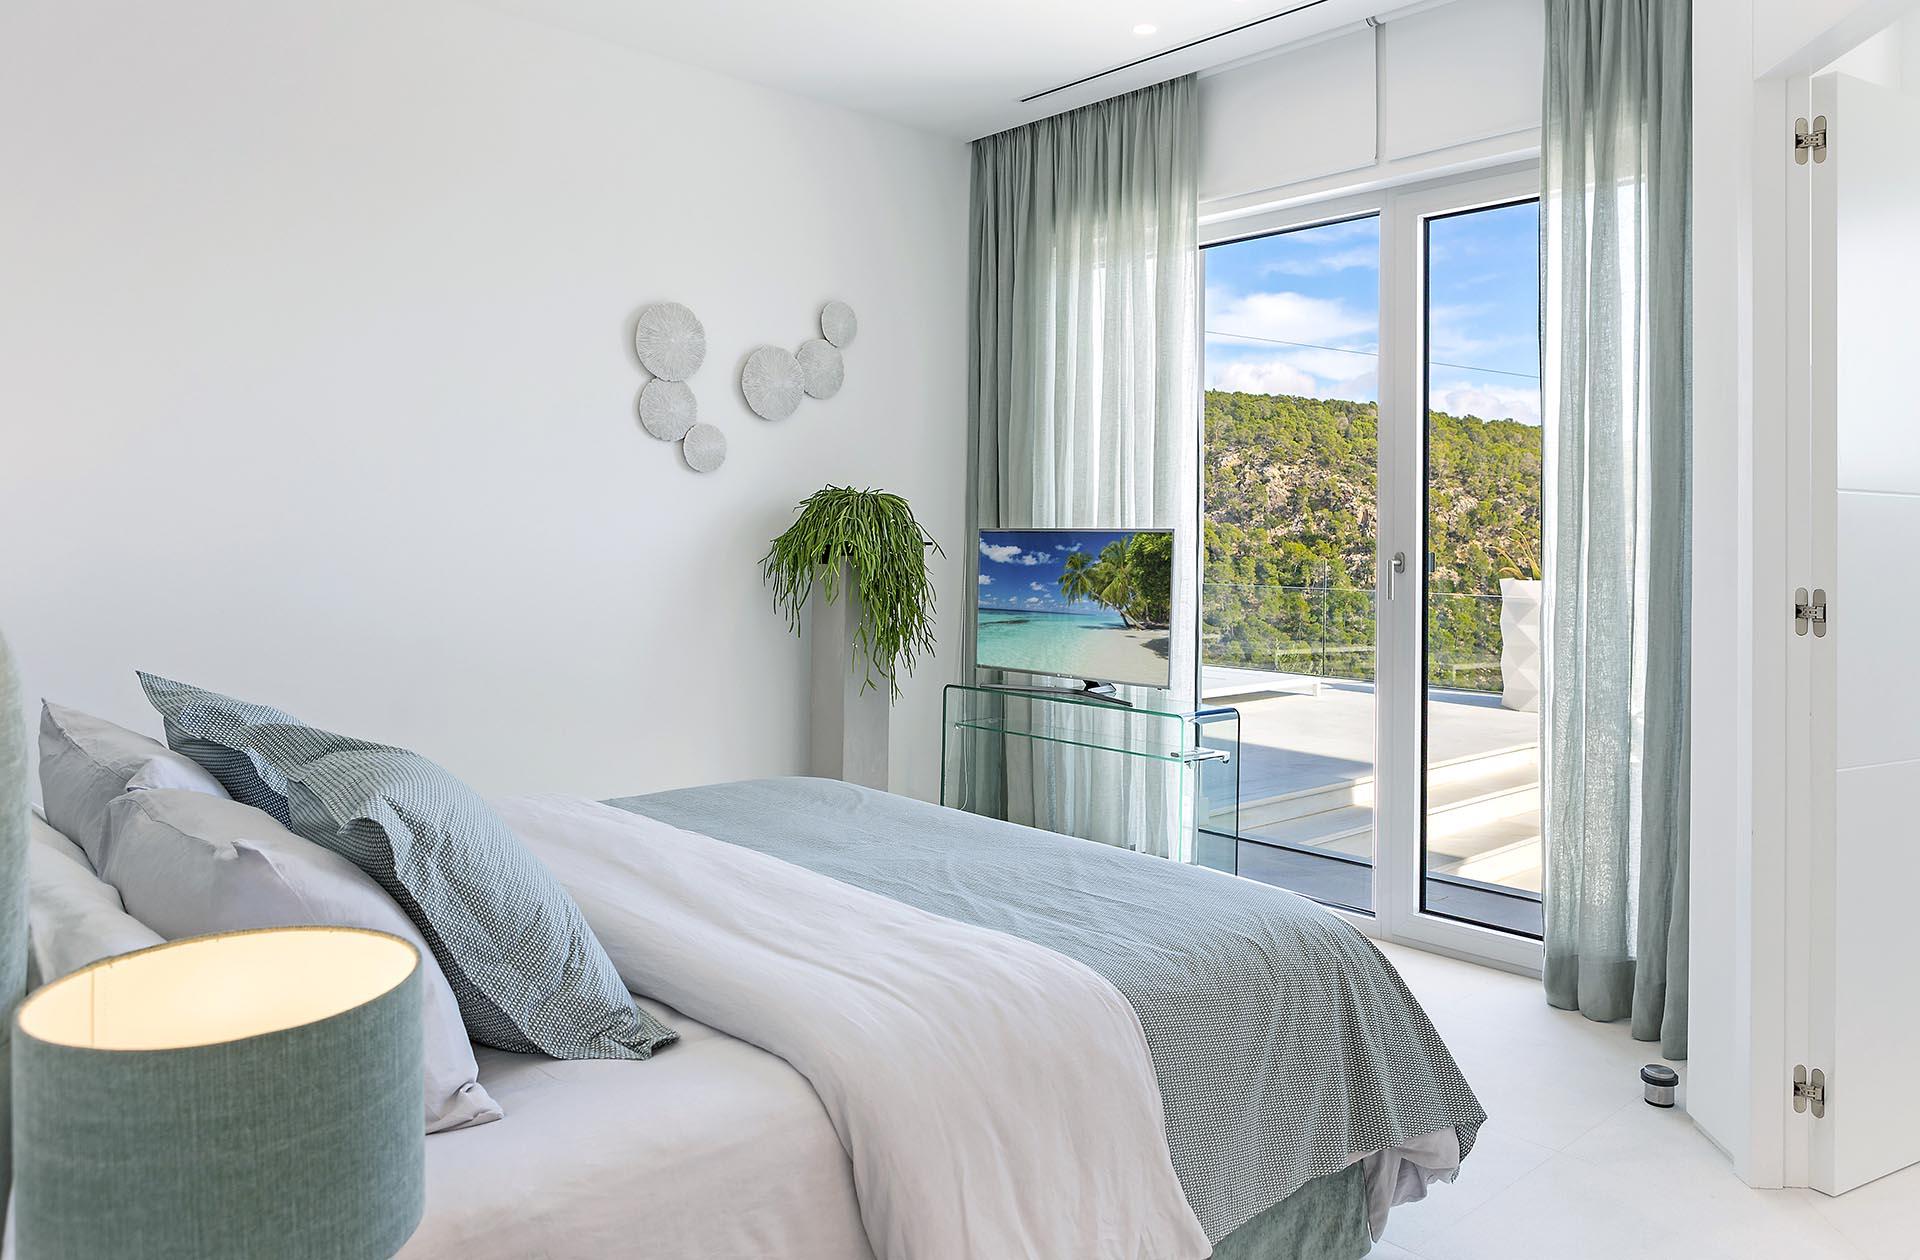 Beautiful modern villa in Costa den Blanes - Cozy bedroom